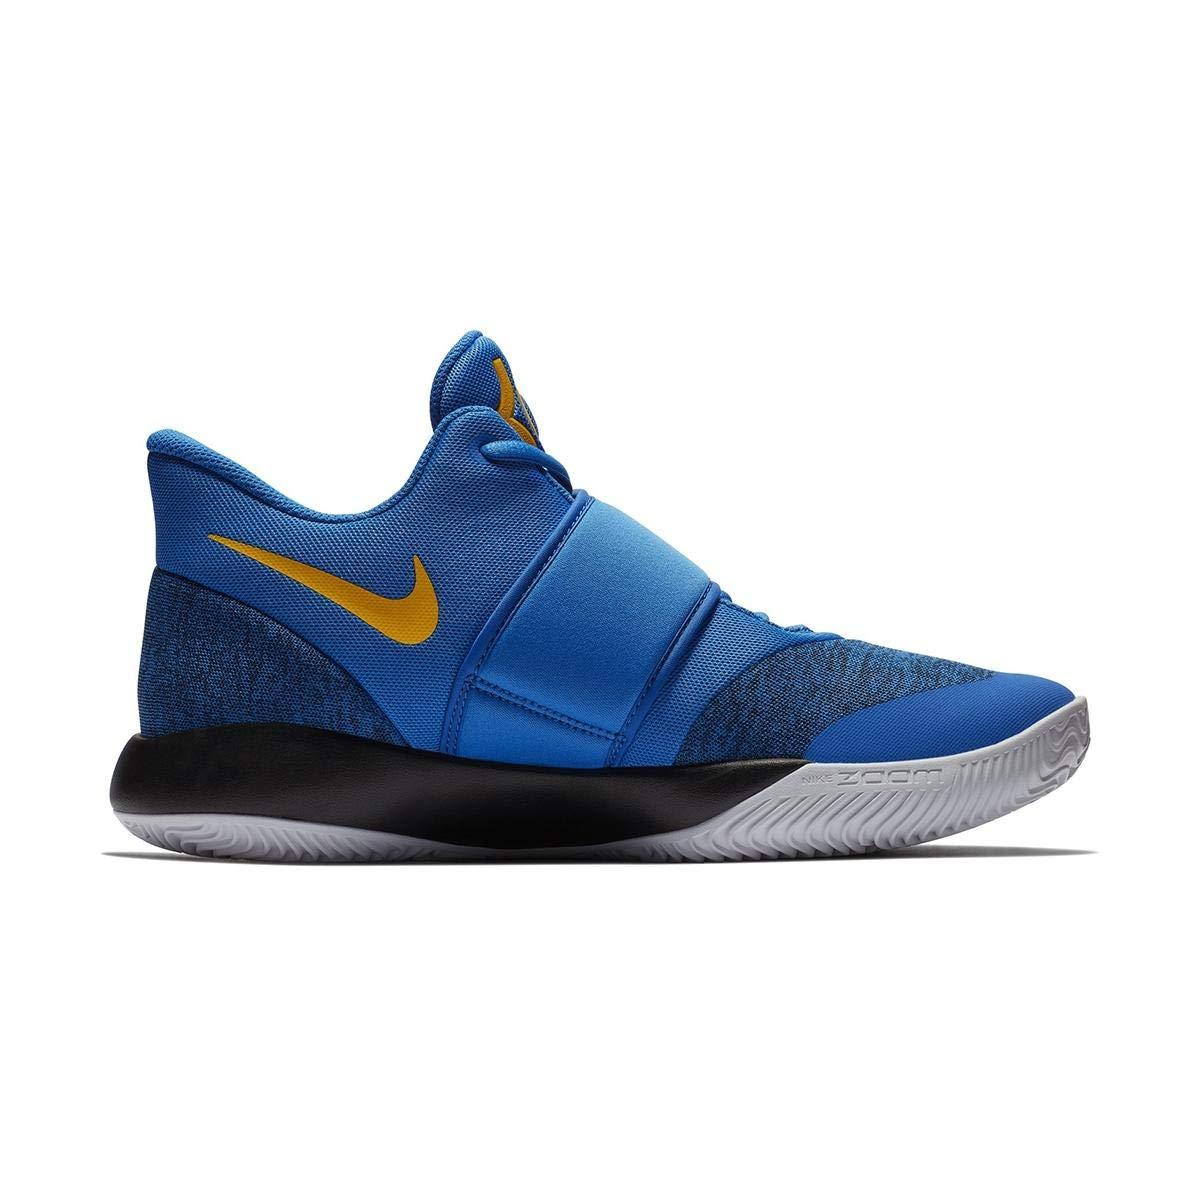 Mehrfarbig (Signal Blau schwarz Weiß Gelb 001) Nike Herren Kd Trey 5 Vi Turnschuhe